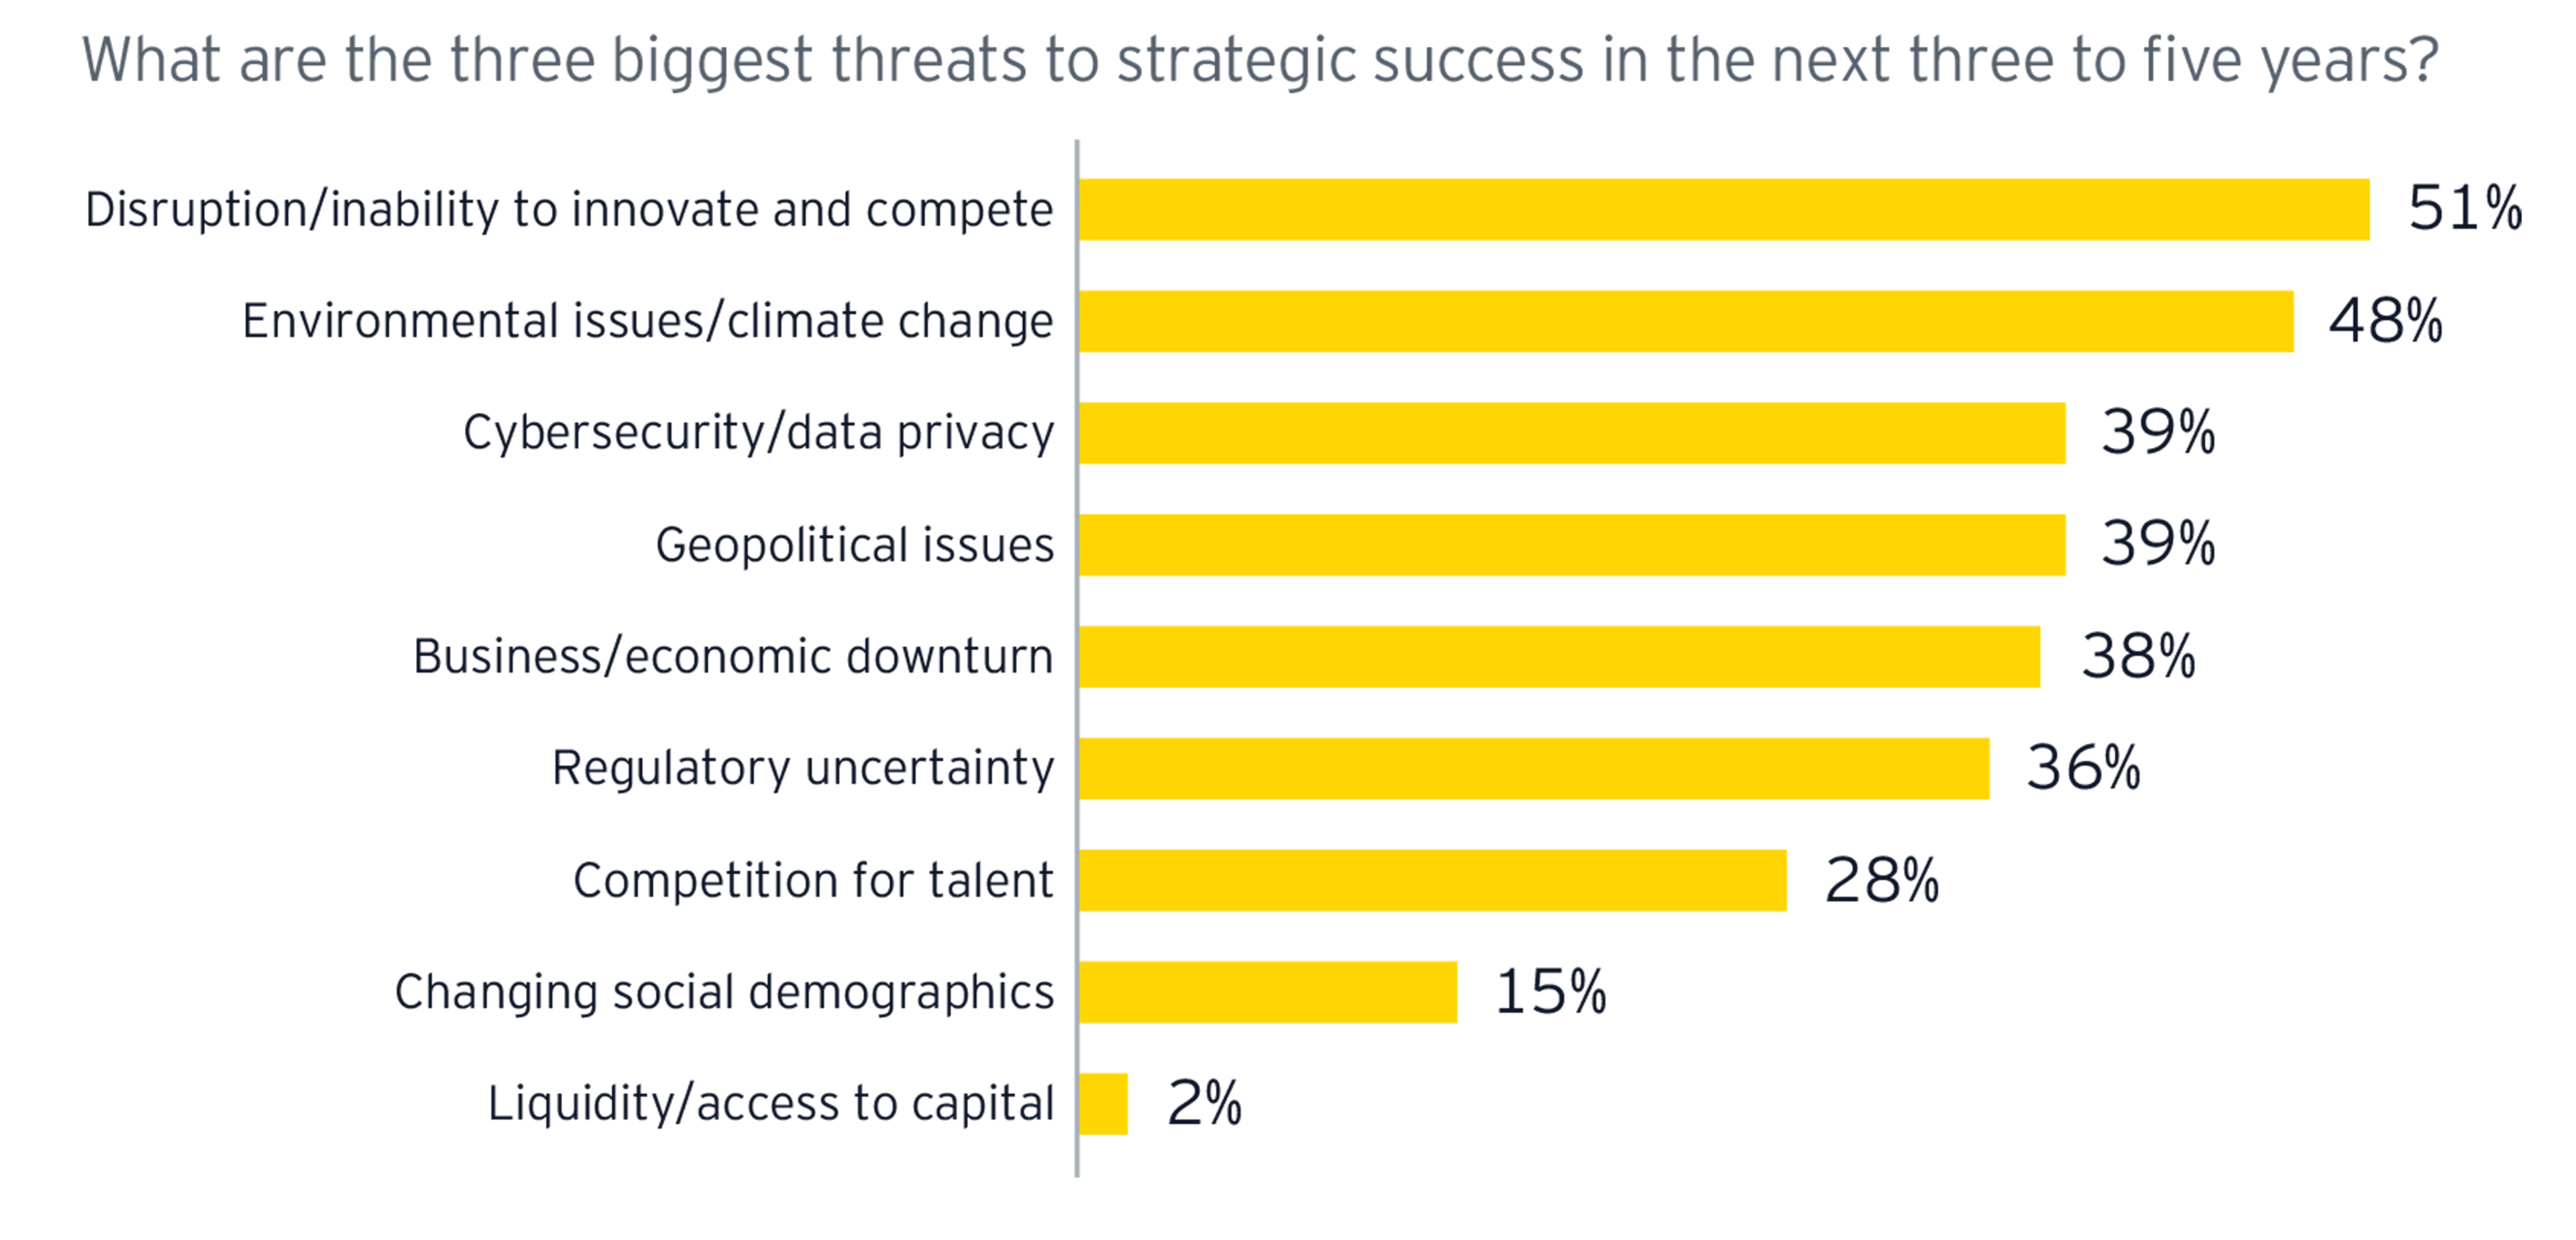 ey-threats-to-strategic-success-3